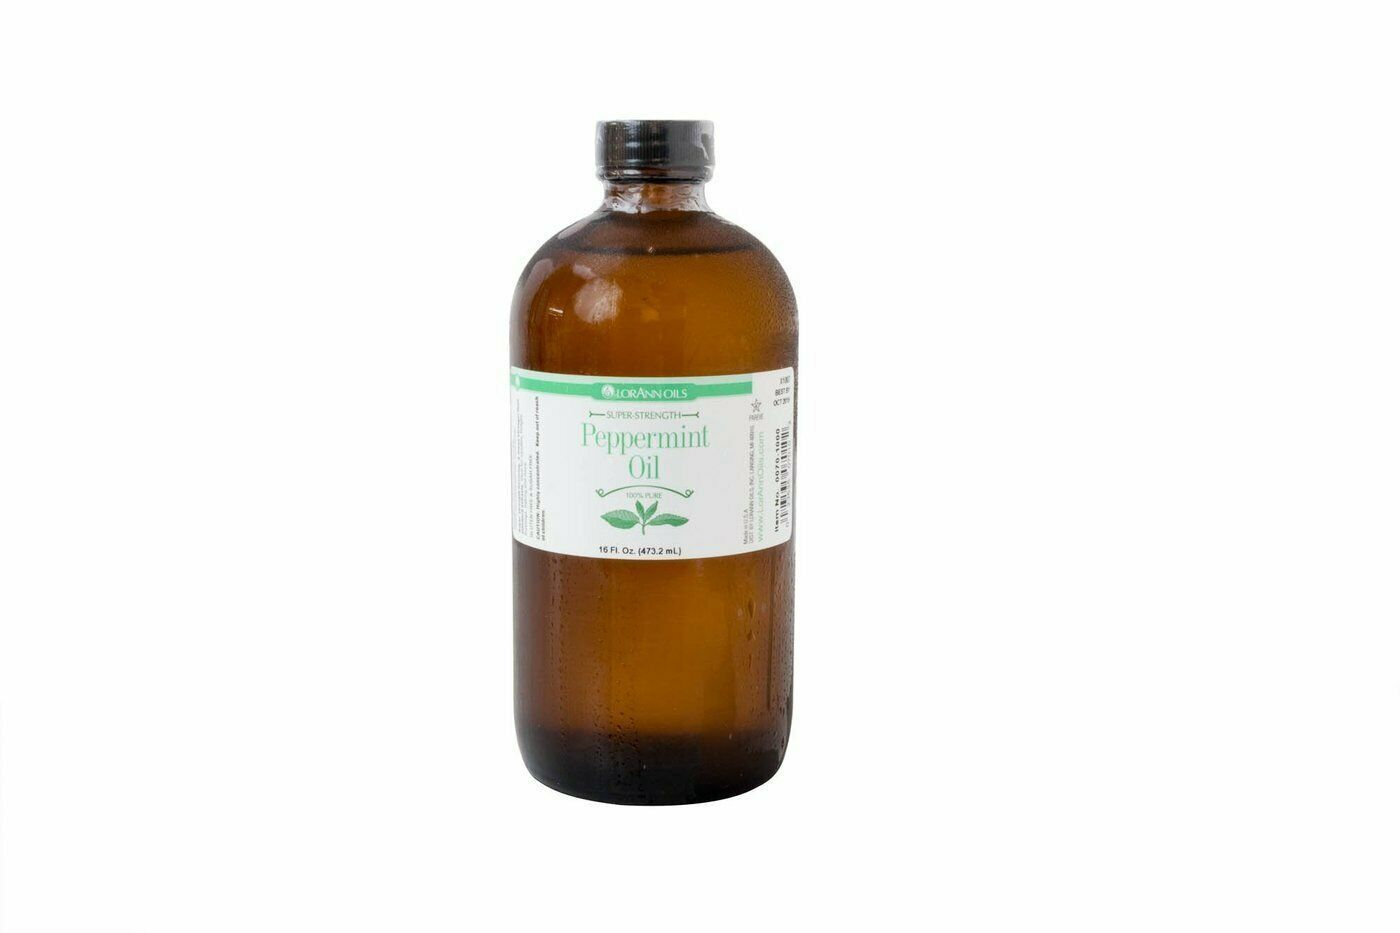 Lorann Oil Natural Peppermint Super Strength Flavor Oil - 16oz - $95.04